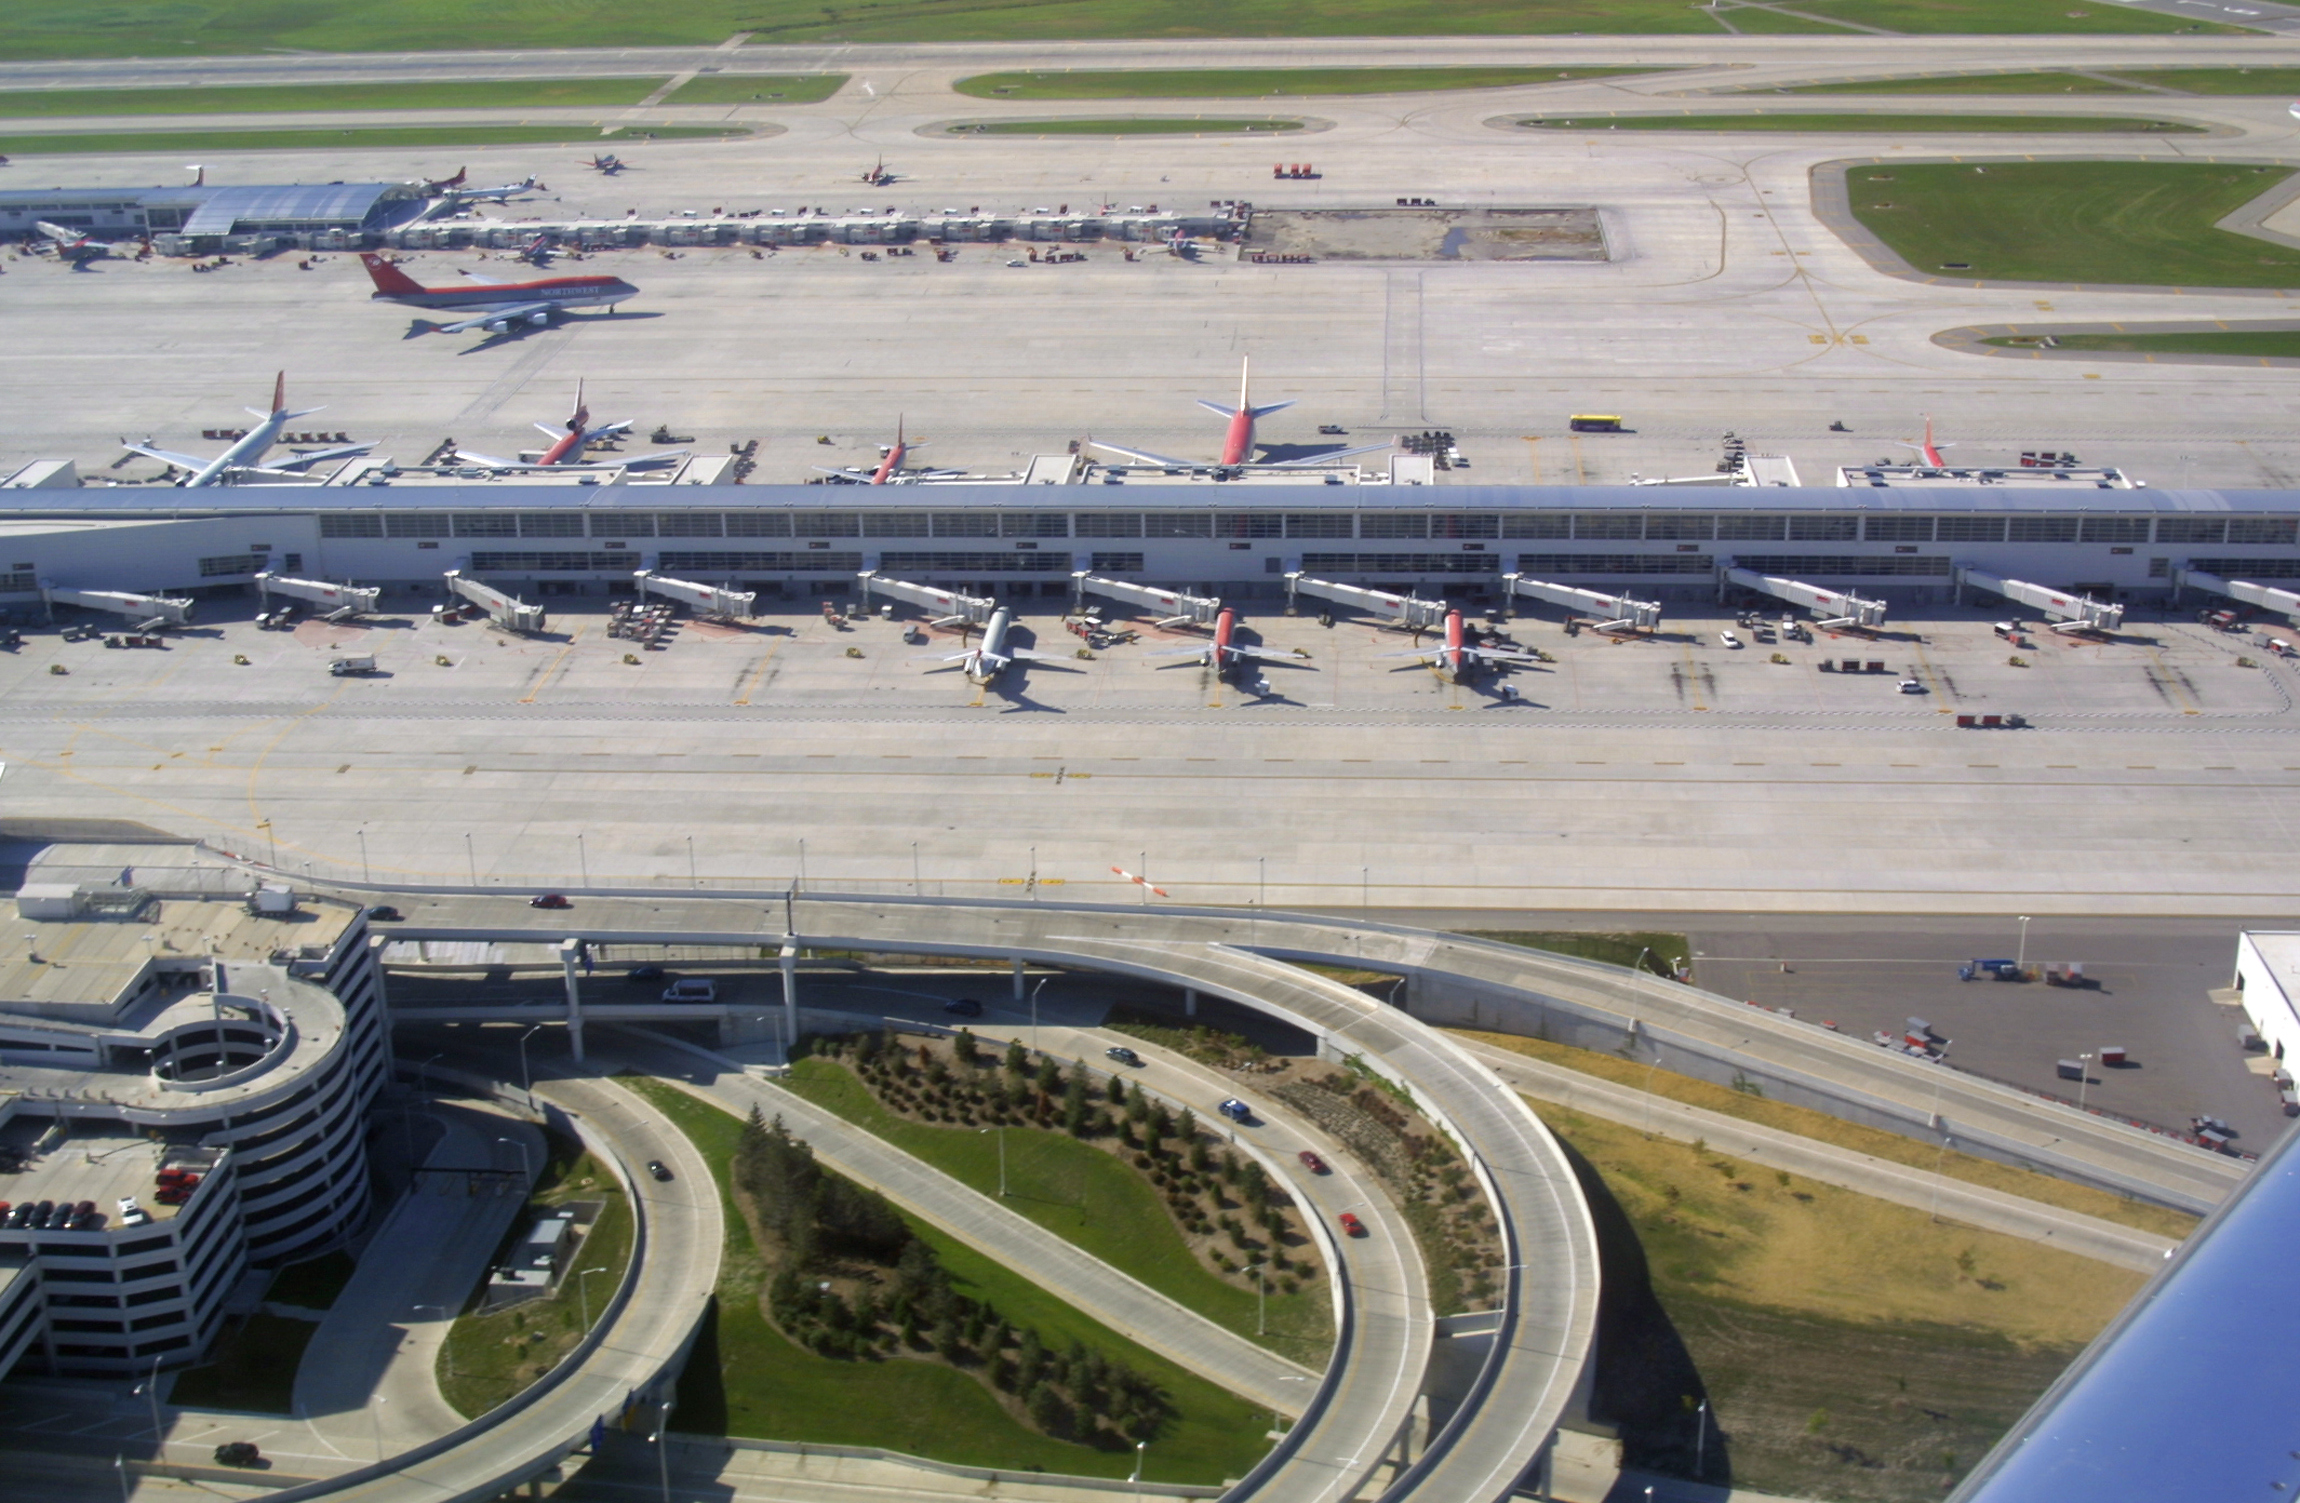 Detroit Metropolitan - Wayne County Airport (DTW)